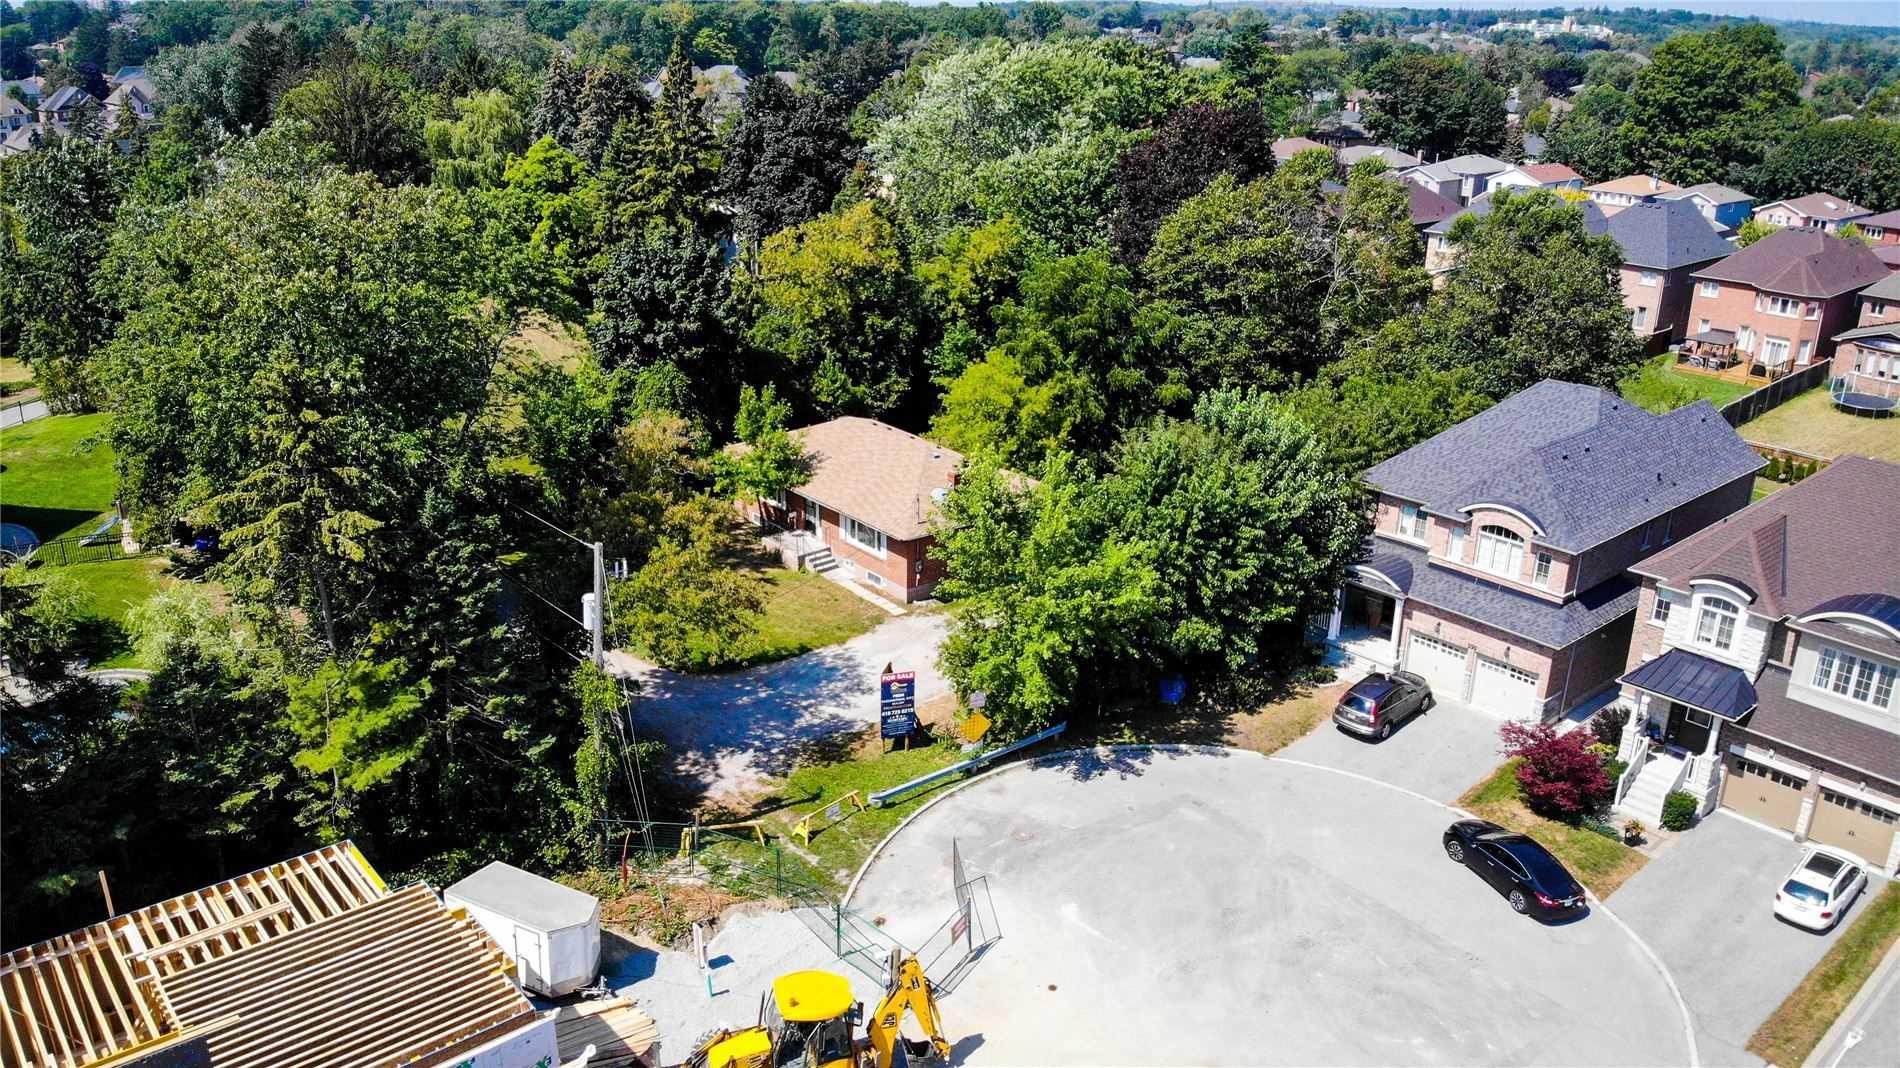 544 Gillmoss Rd, Pickering, Ontario L1W3J4, 3 Bedrooms Bedrooms, 3 Rooms Rooms,1 BathroomBathrooms,Detached,For Sale,Gillmoss,E5352724